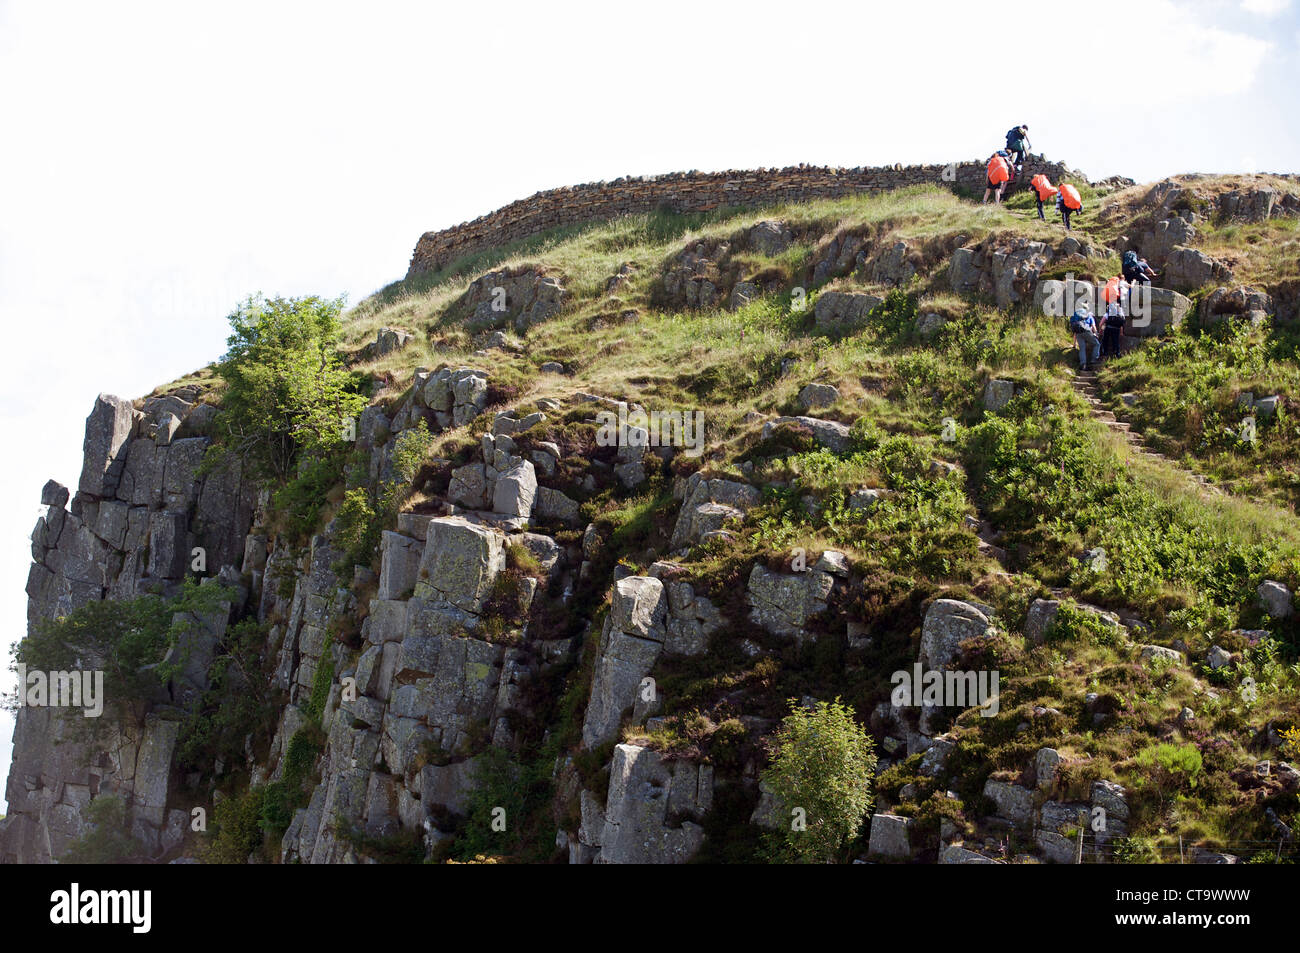 Hill walkers, Hadrian's Wall,  Steel Rig, Northumberland, UK. - Stock Image